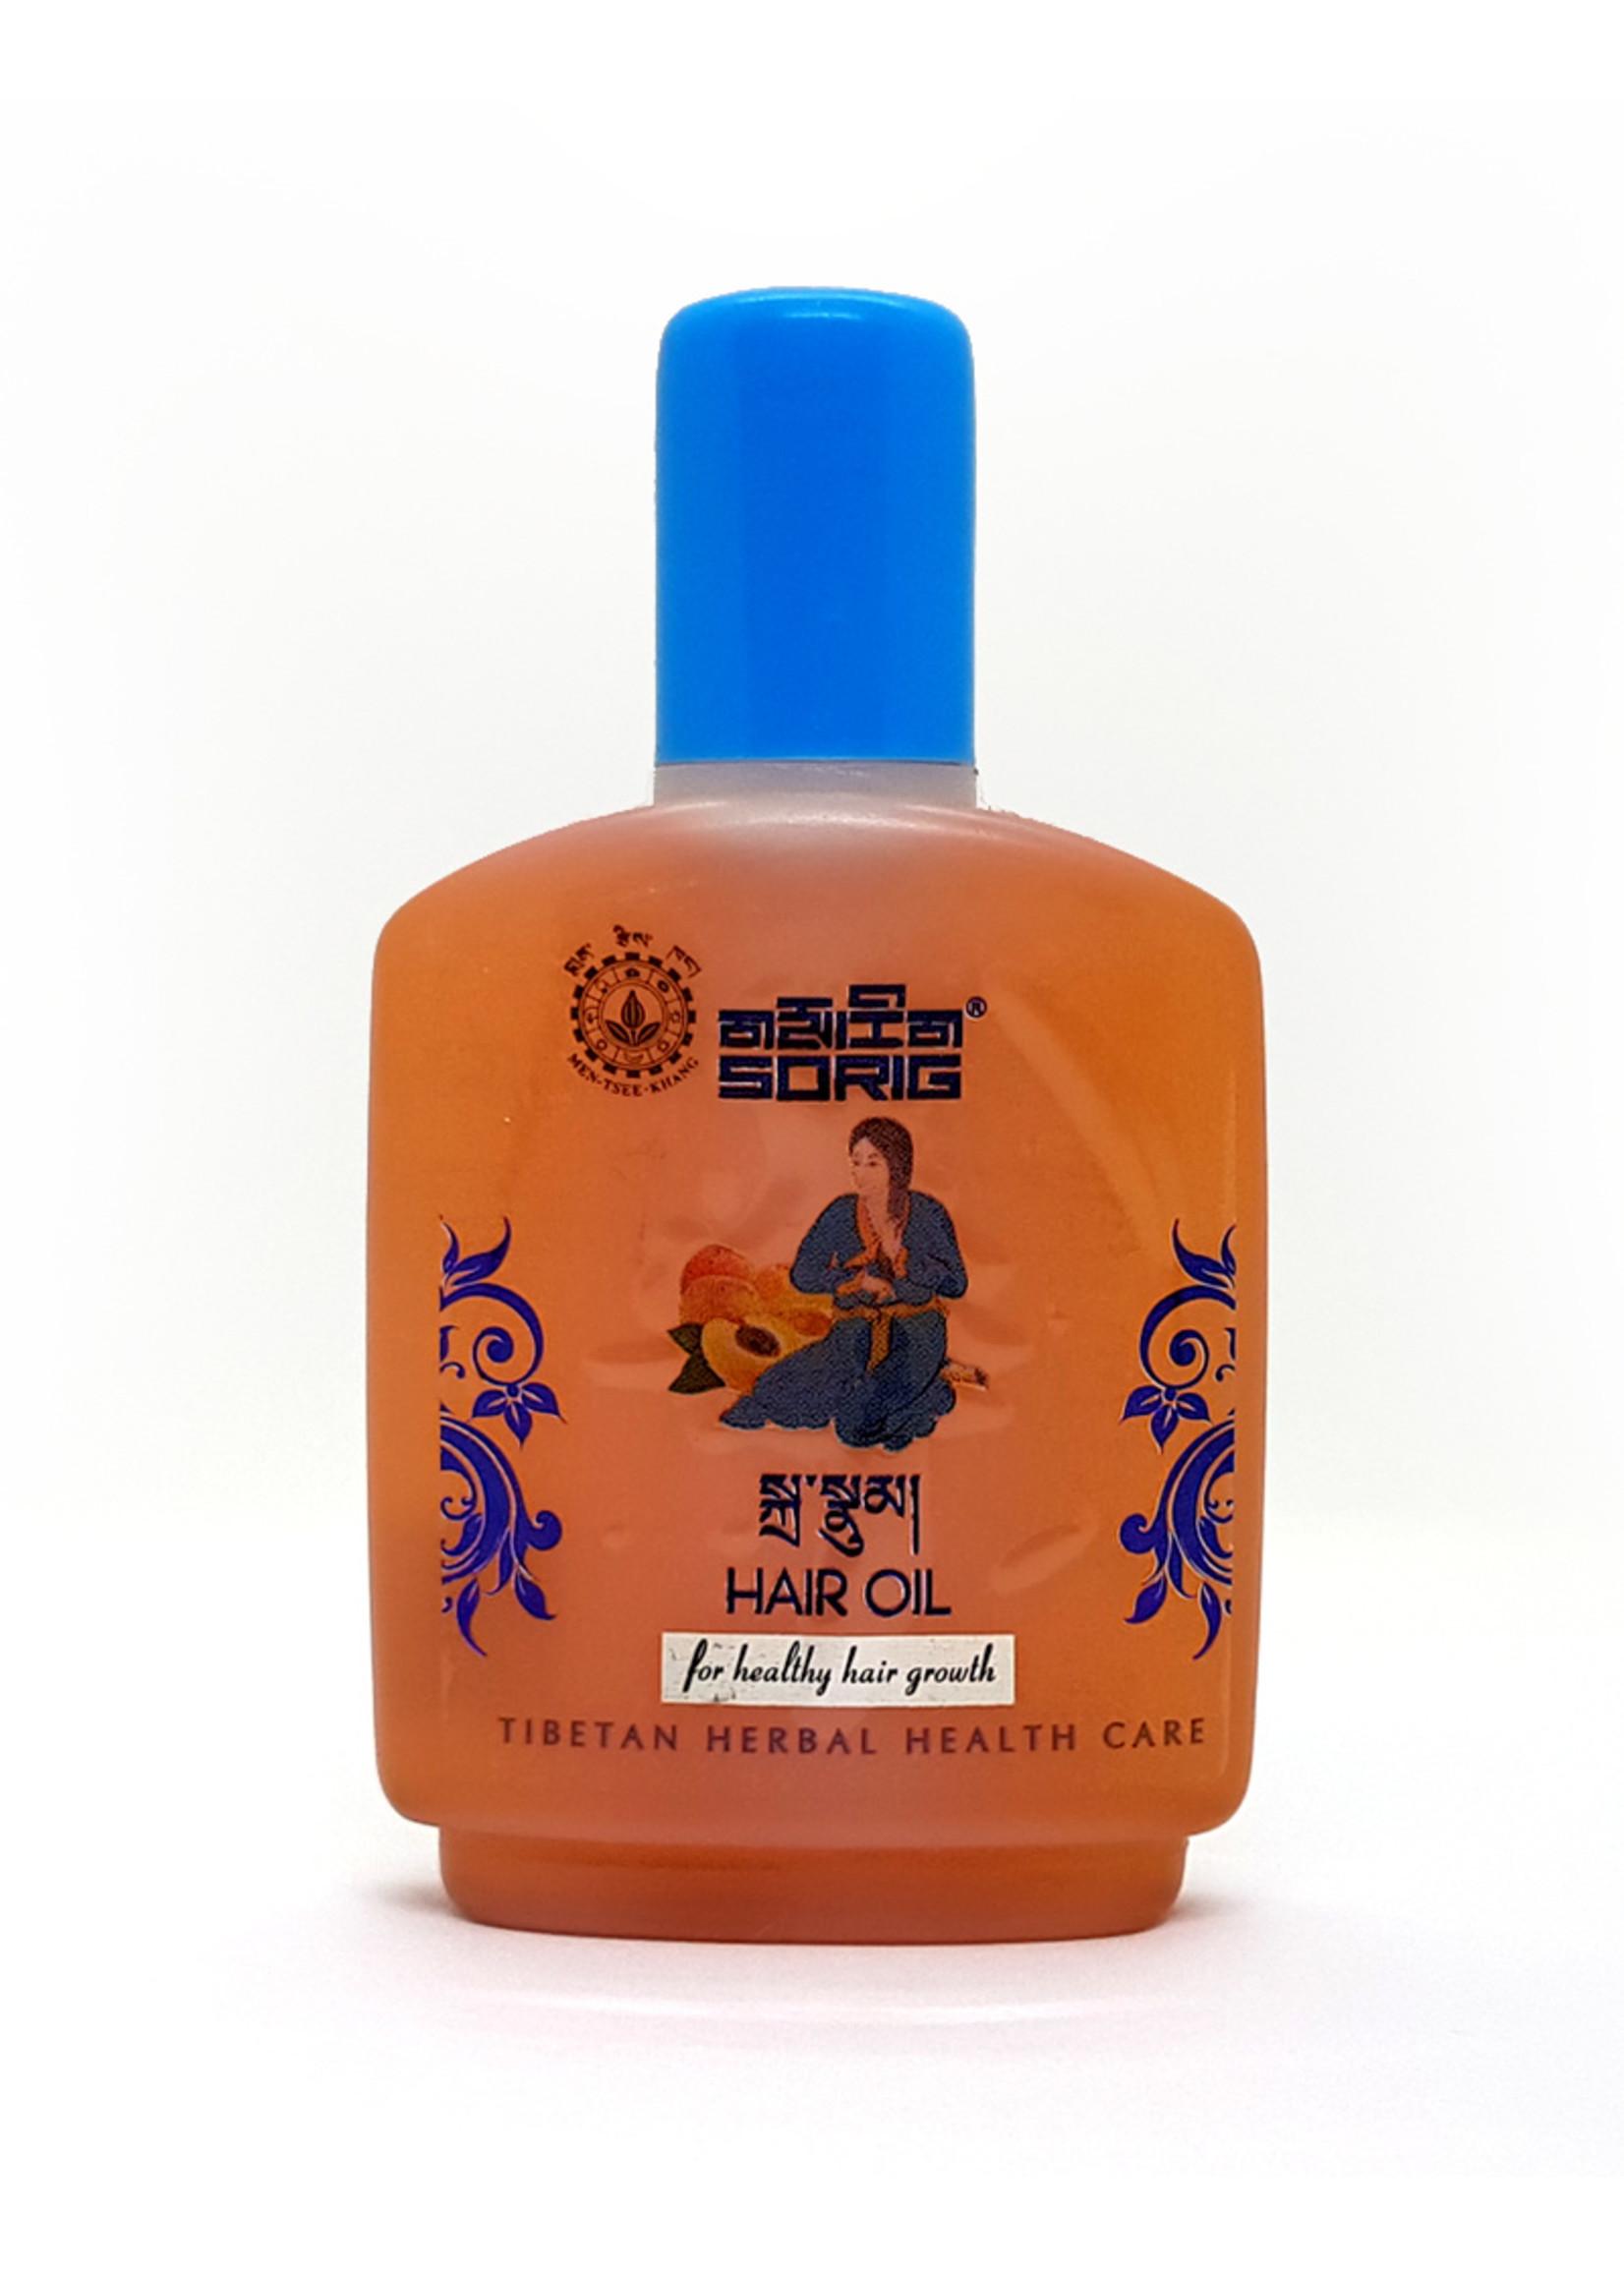 Tibetisches Kräuter-Haaröl SORIG TA-NUUM, 100 ml